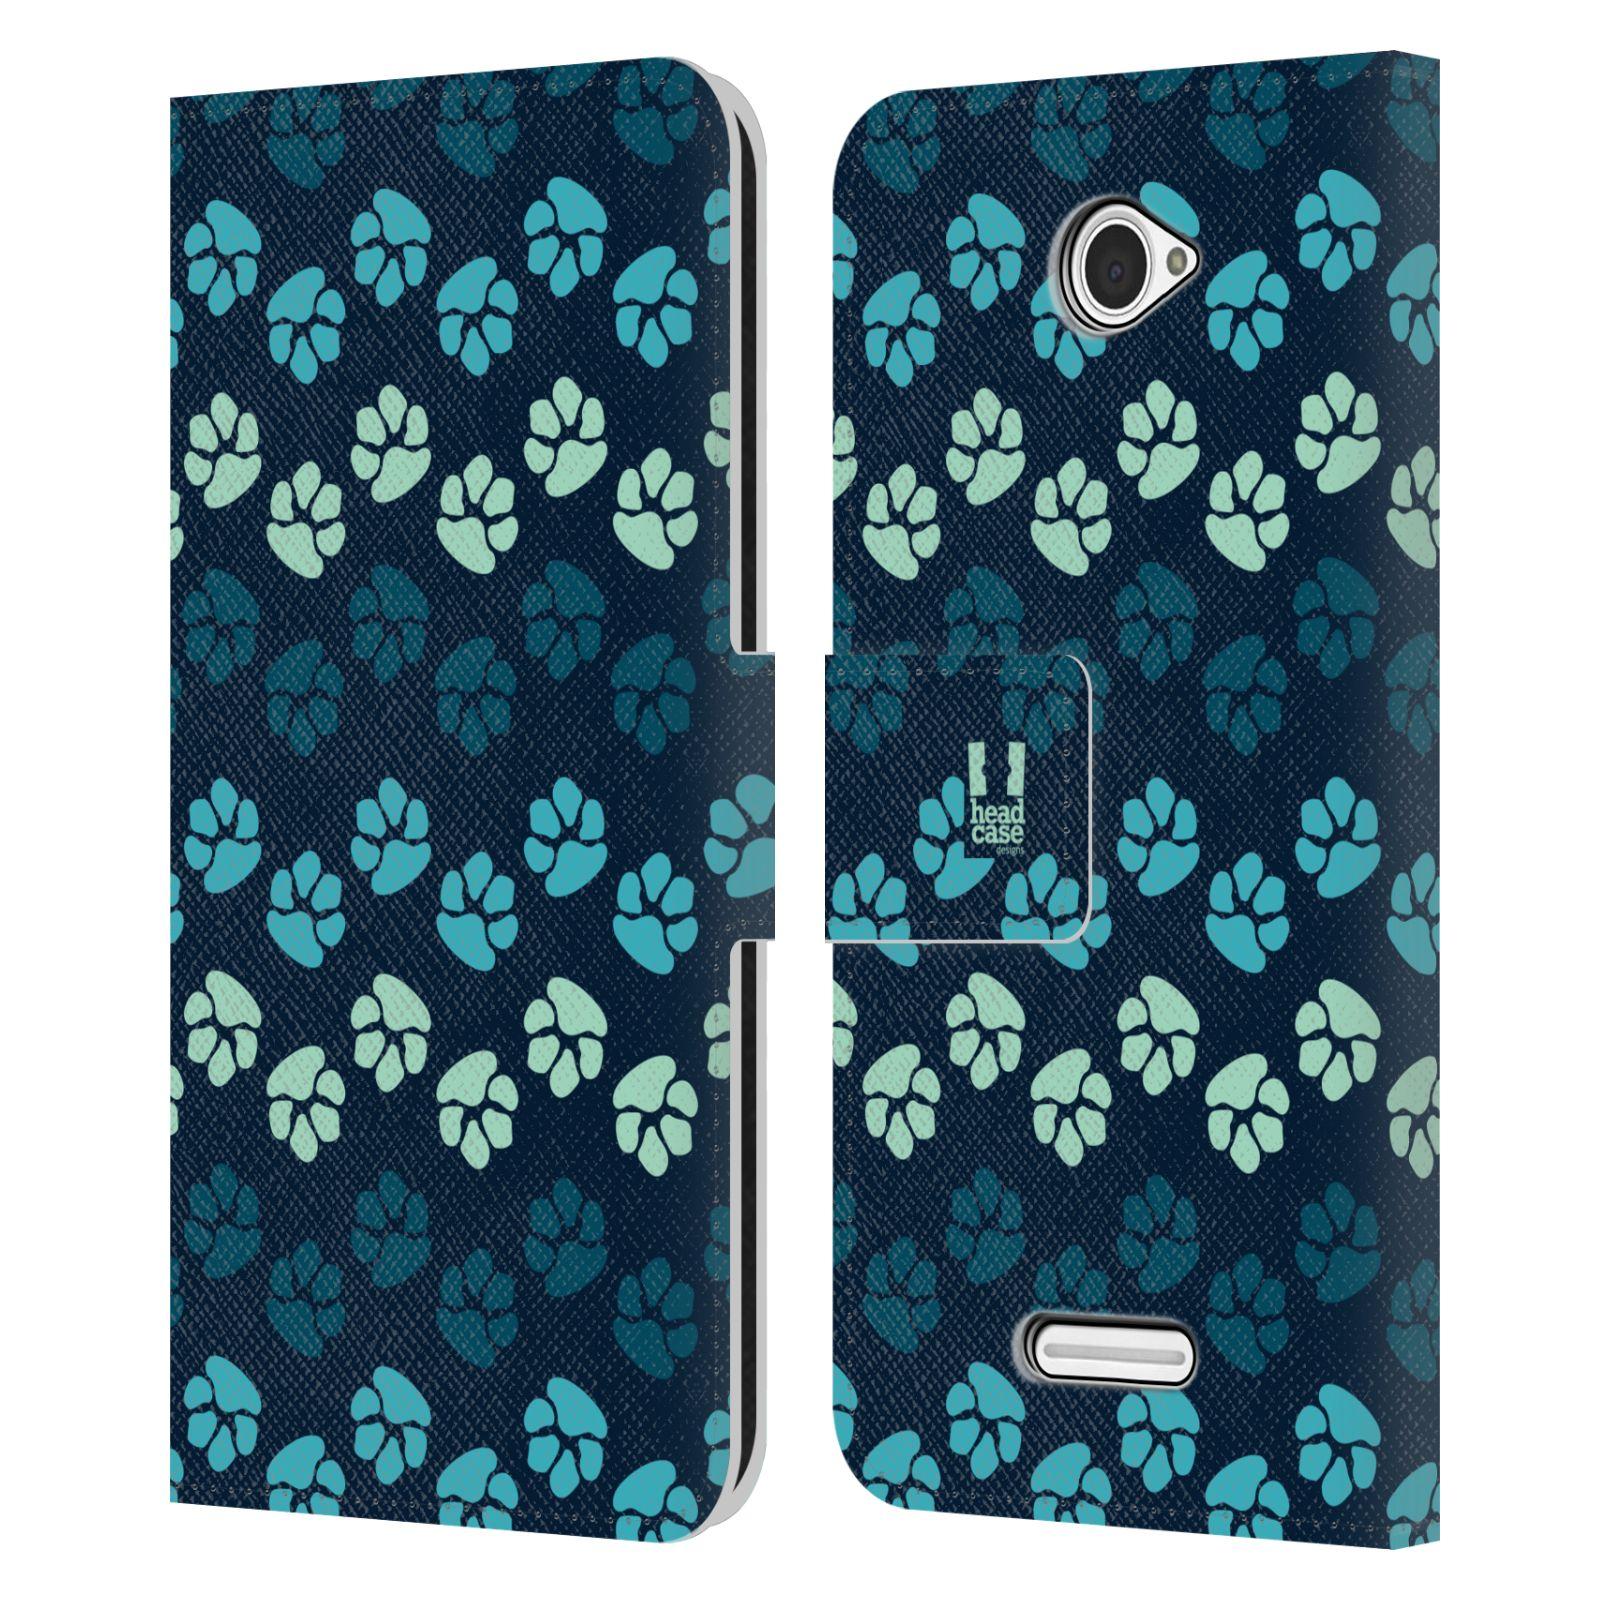 HEAD CASE Flipové pouzdro pro mobil SONY XPERIA E4 Pejsek ťapky modrá barva